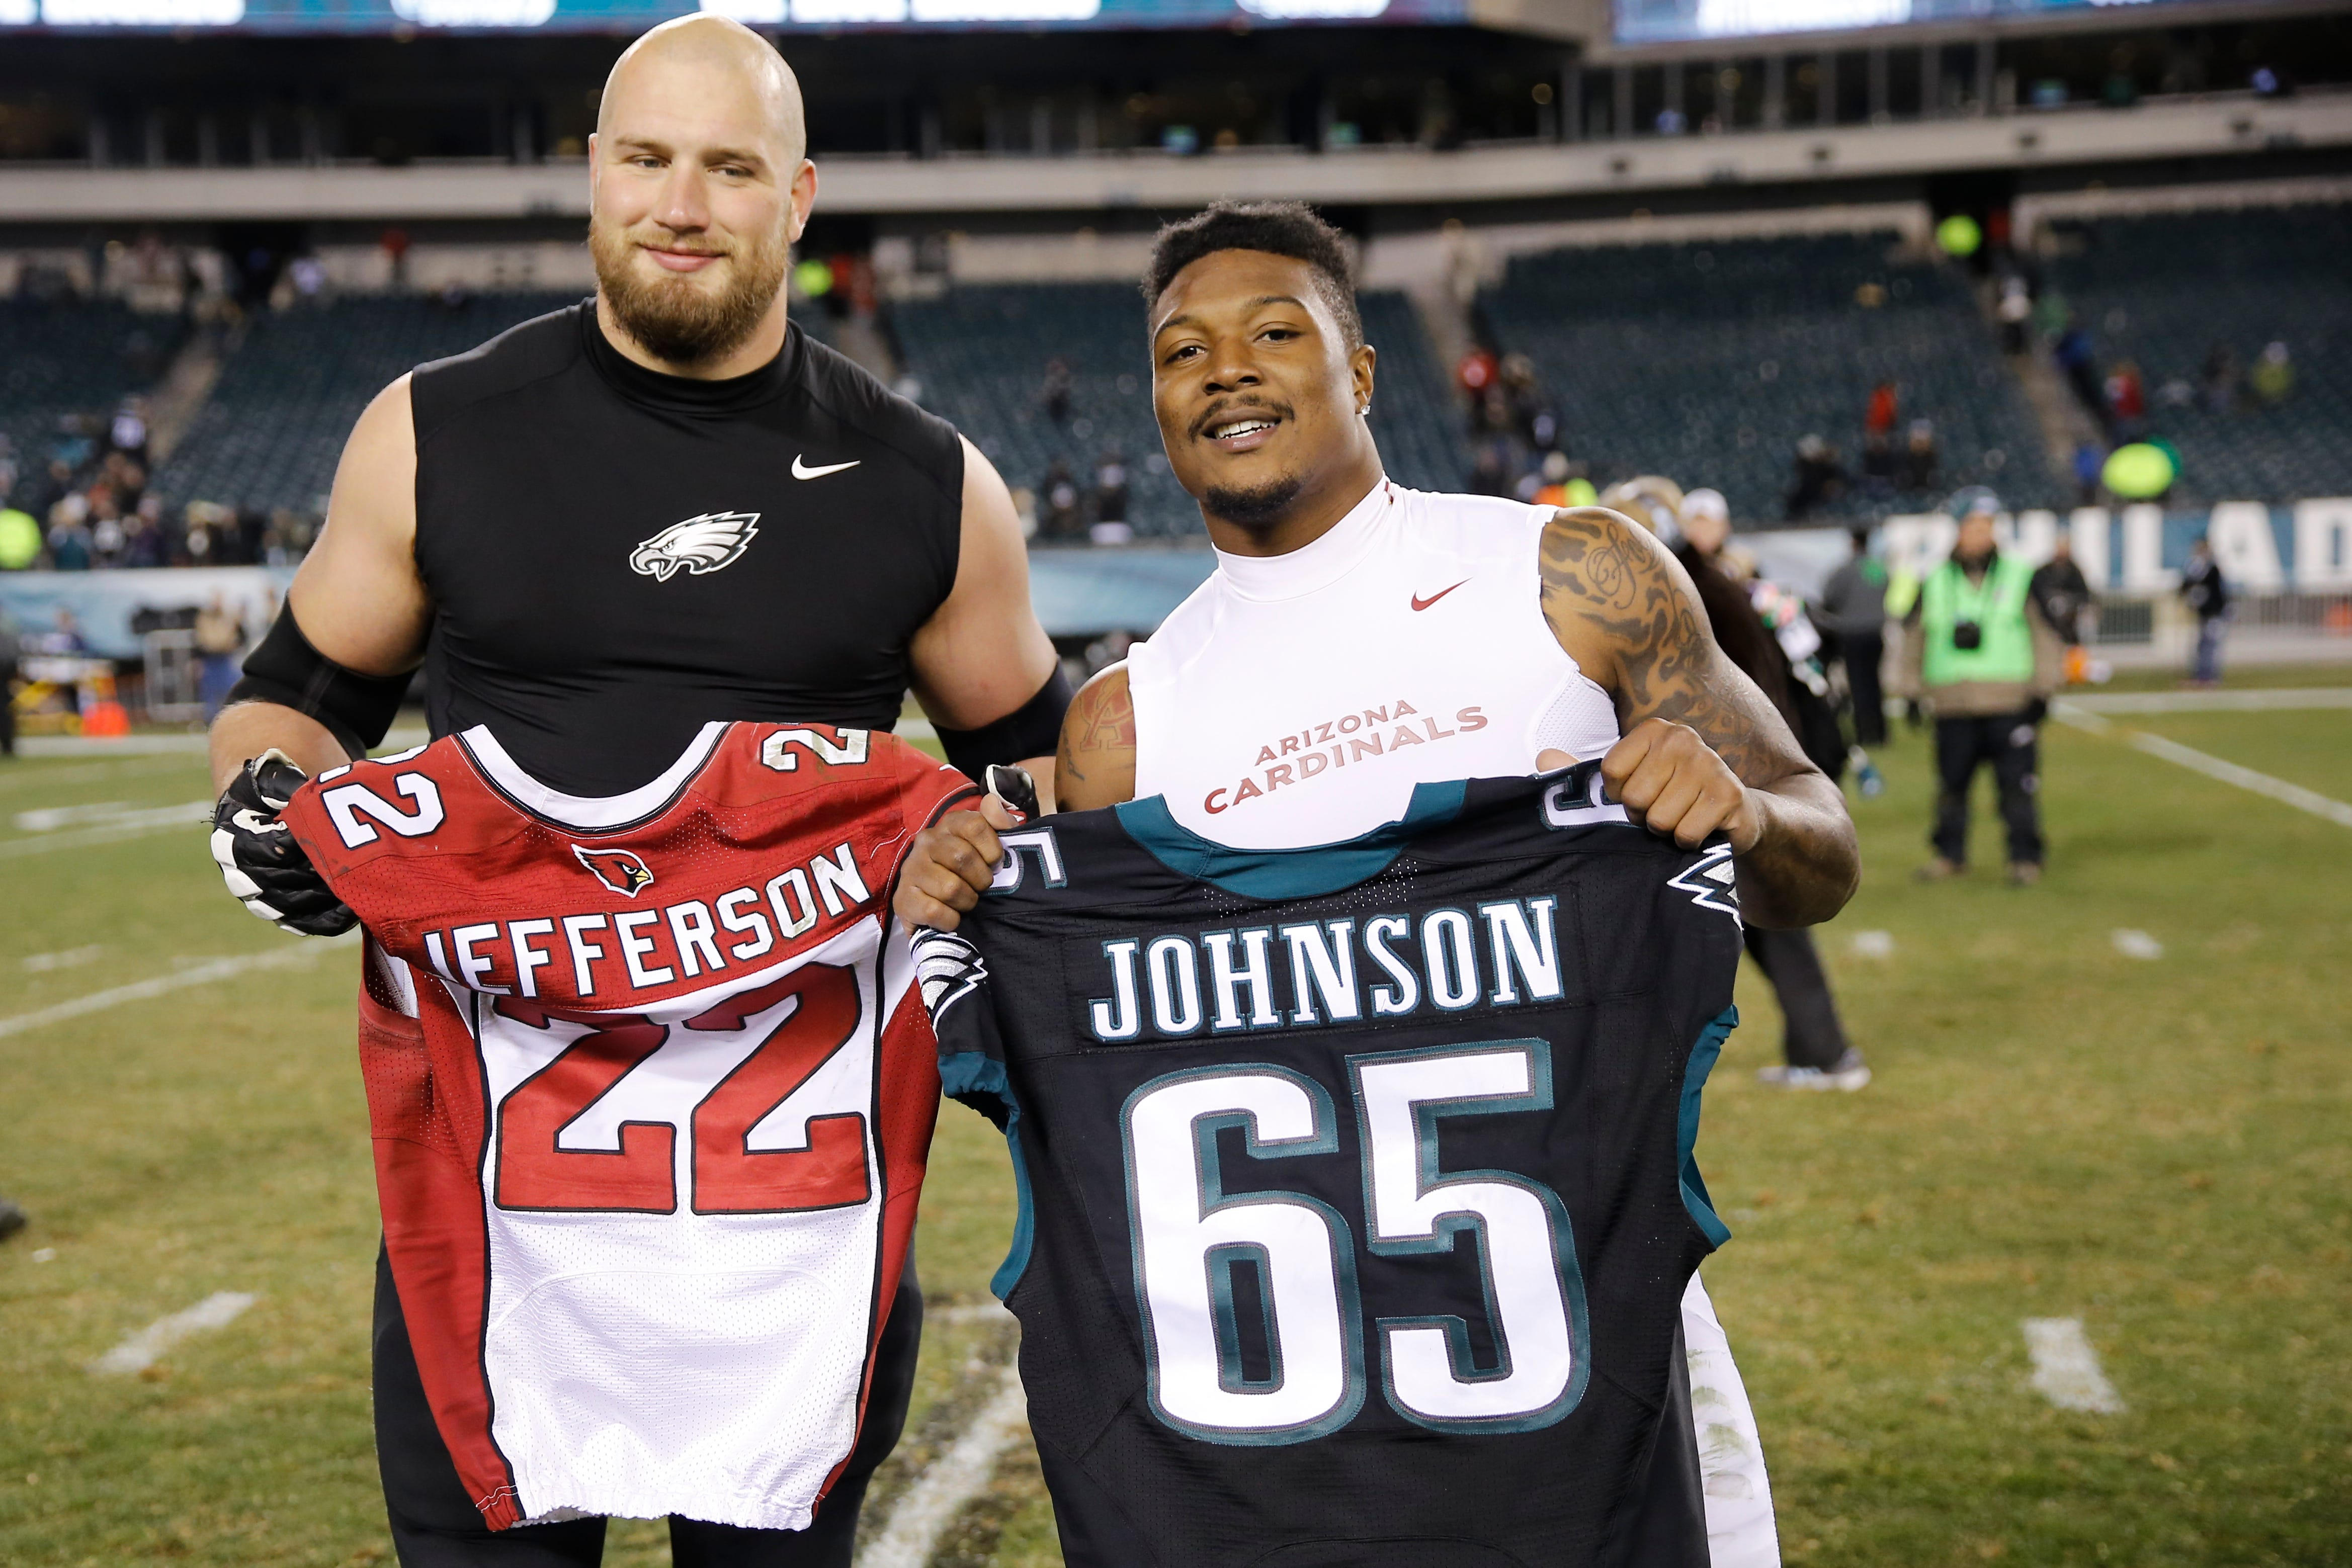 NFL players trading jerseys